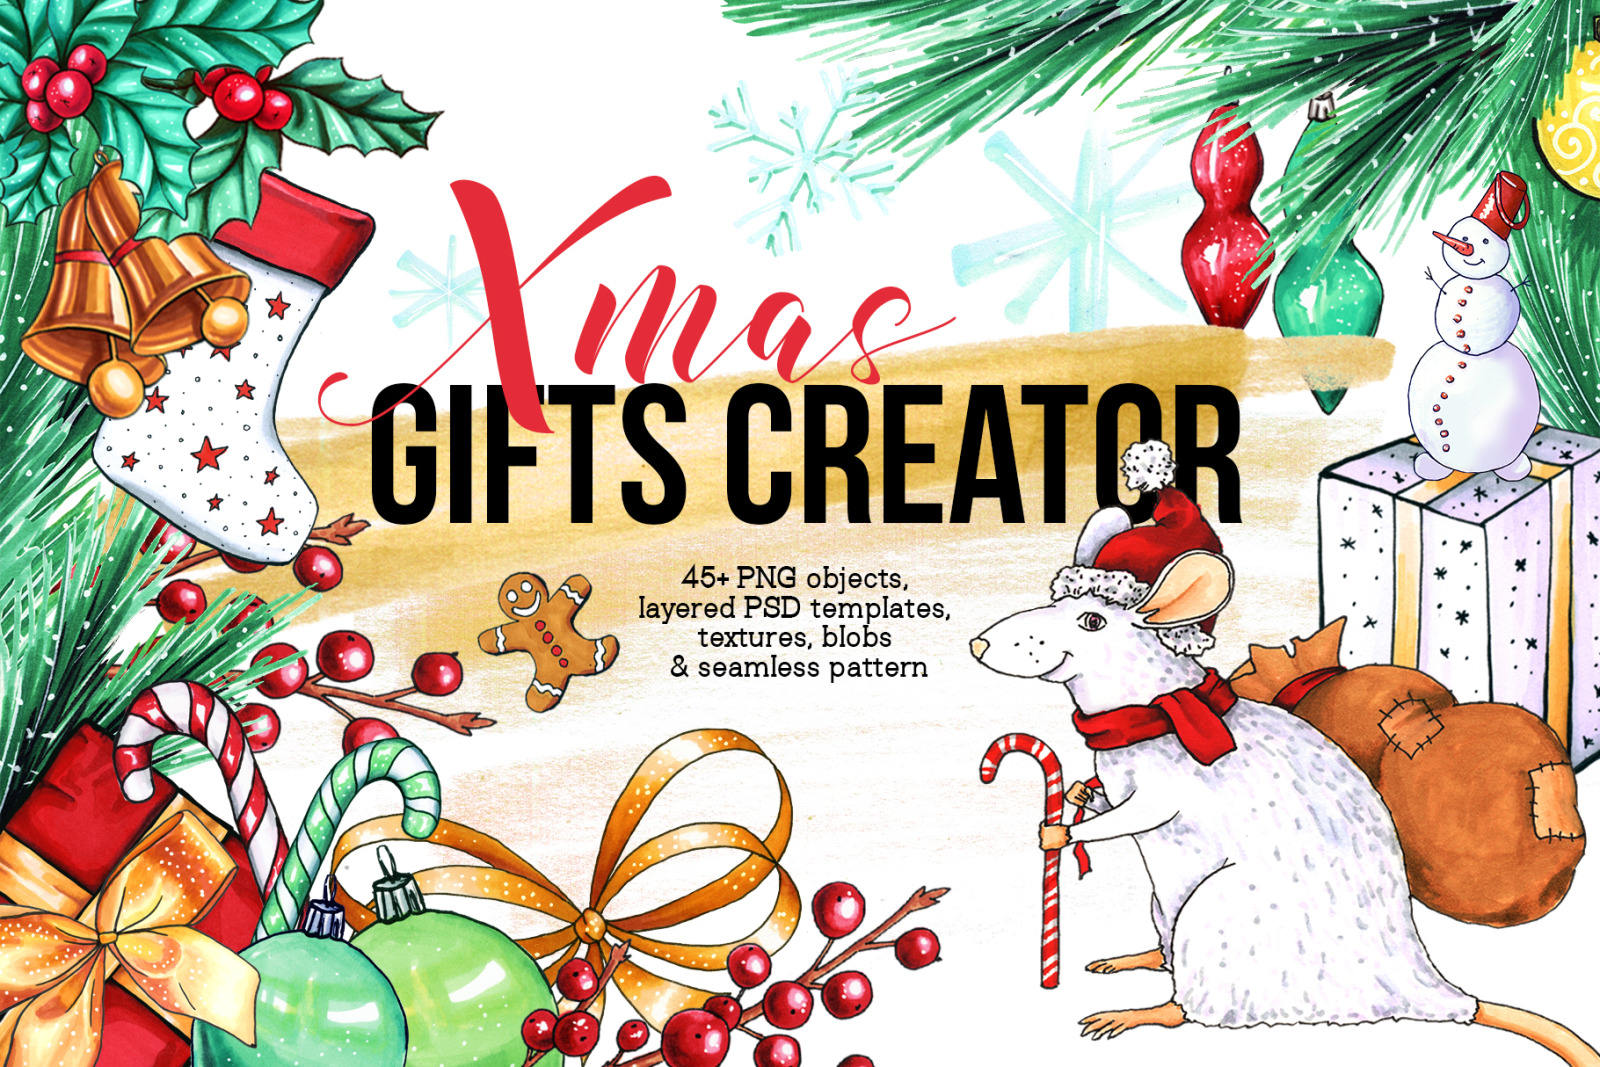 Xmas Gifts Creator - 2020 holidays clipart